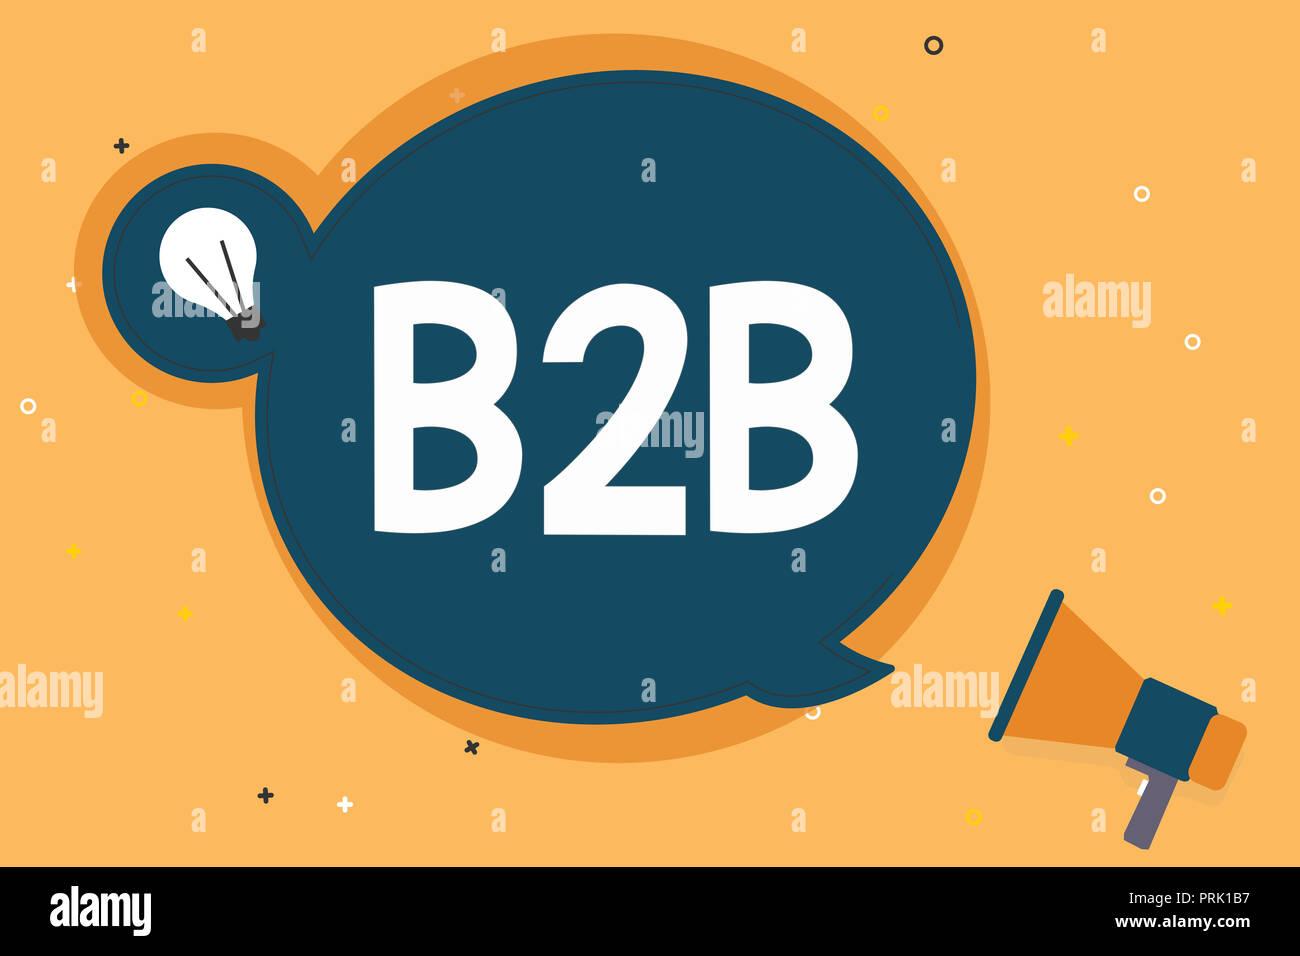 The B2B